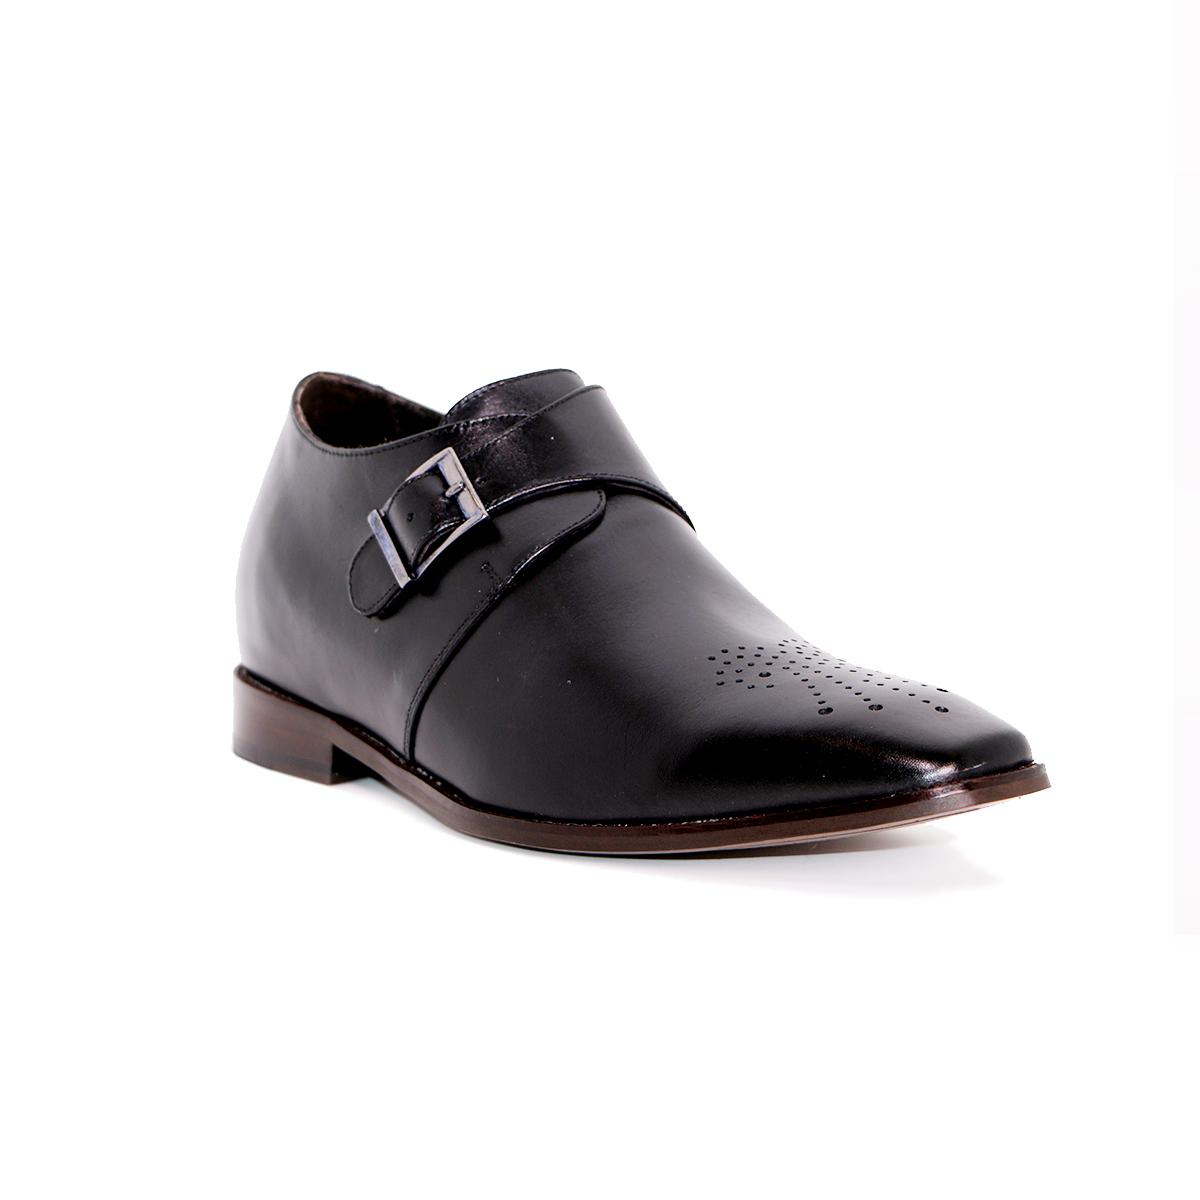 Zapato Formal Gentleman Negro Max Denegri +7cms De Altura_72917